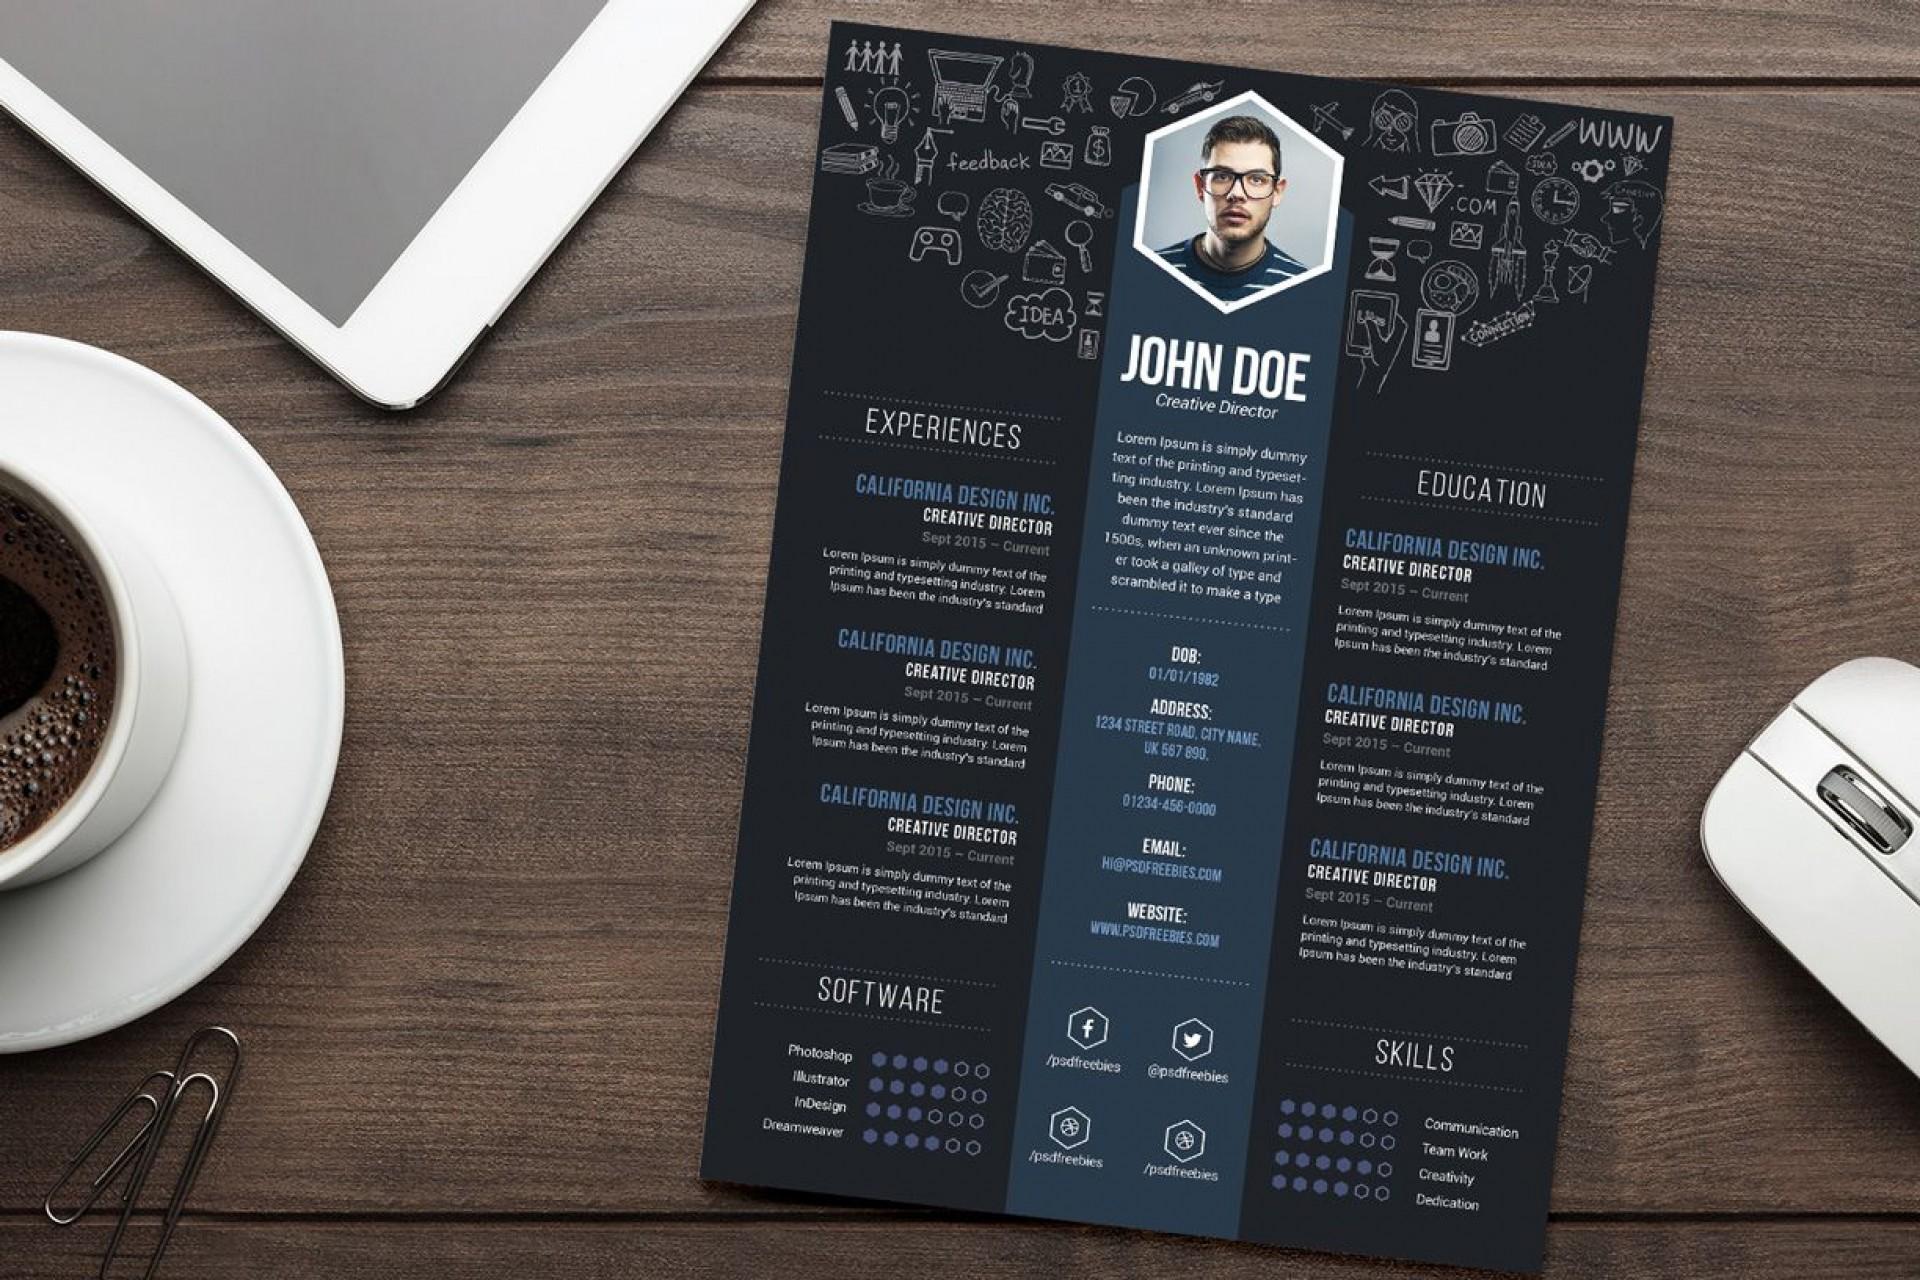 005 Sensational Cv Design Photoshop Template Free Sample  Resume Psd Download1920